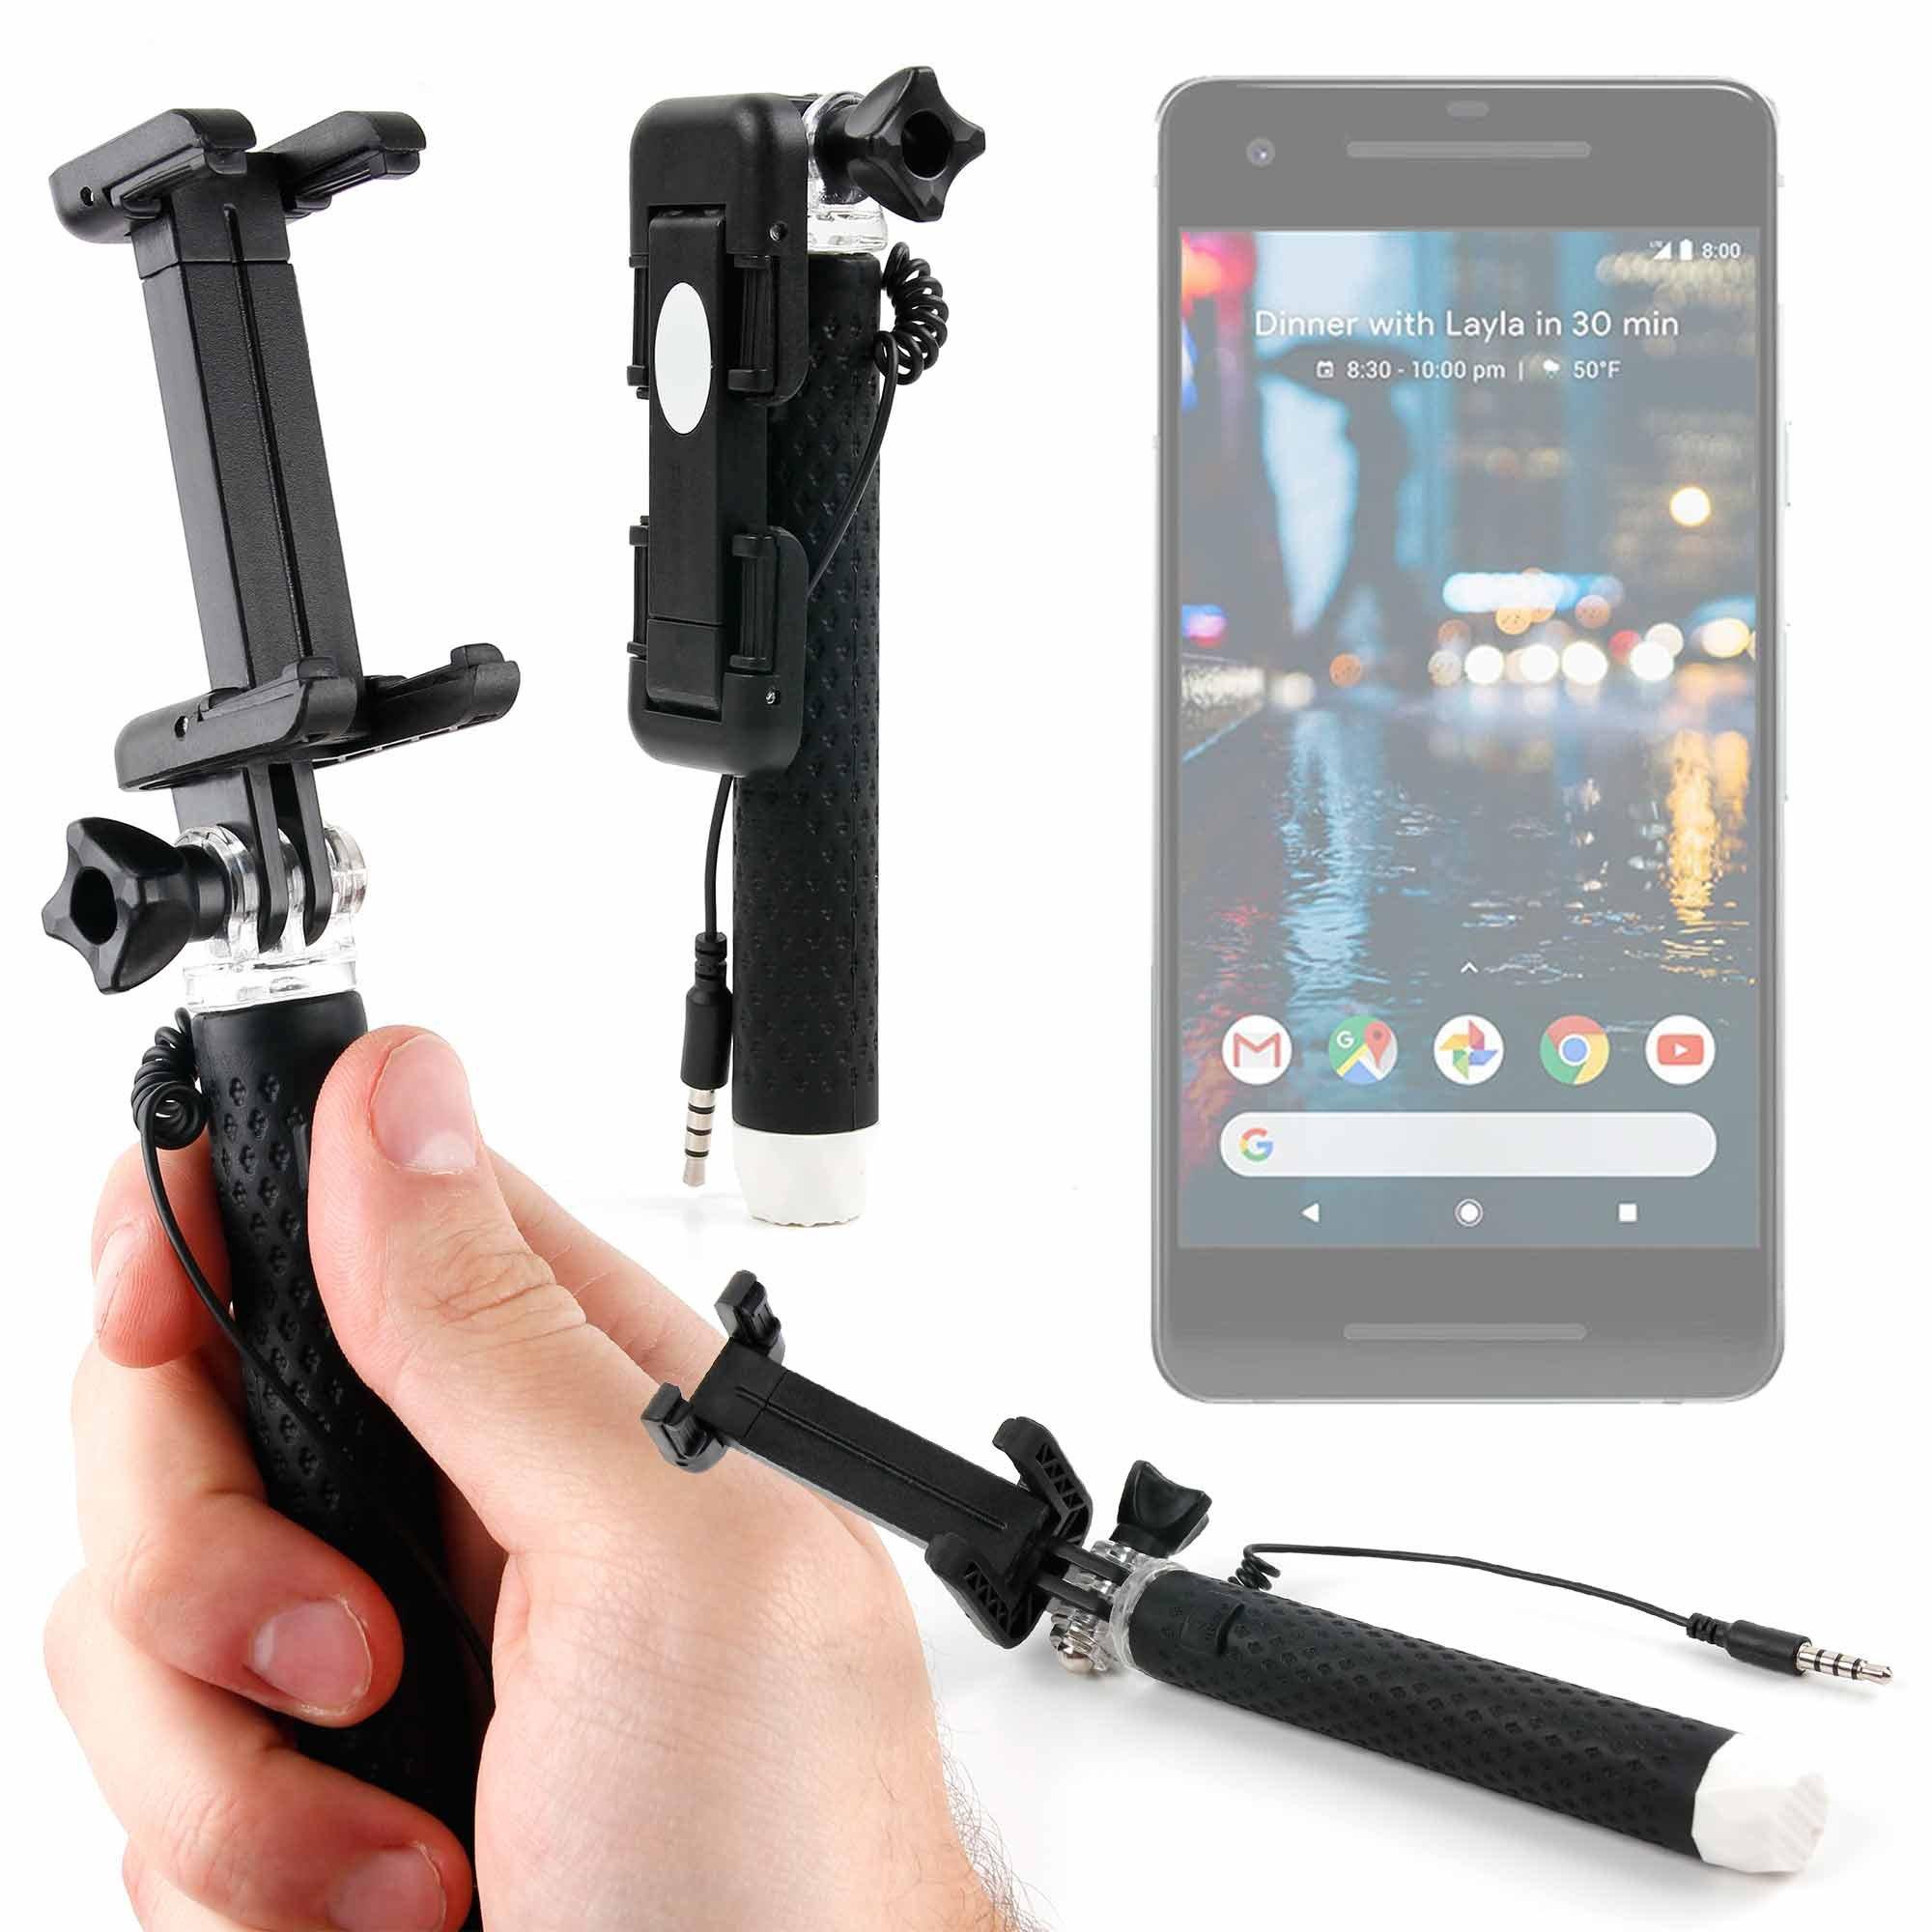 DURAGADGET Mini Pocket Wired Selfie Stick - Compatible with The Google Pixel   Pixel 2   Pixel XL   Pixel 2 XL